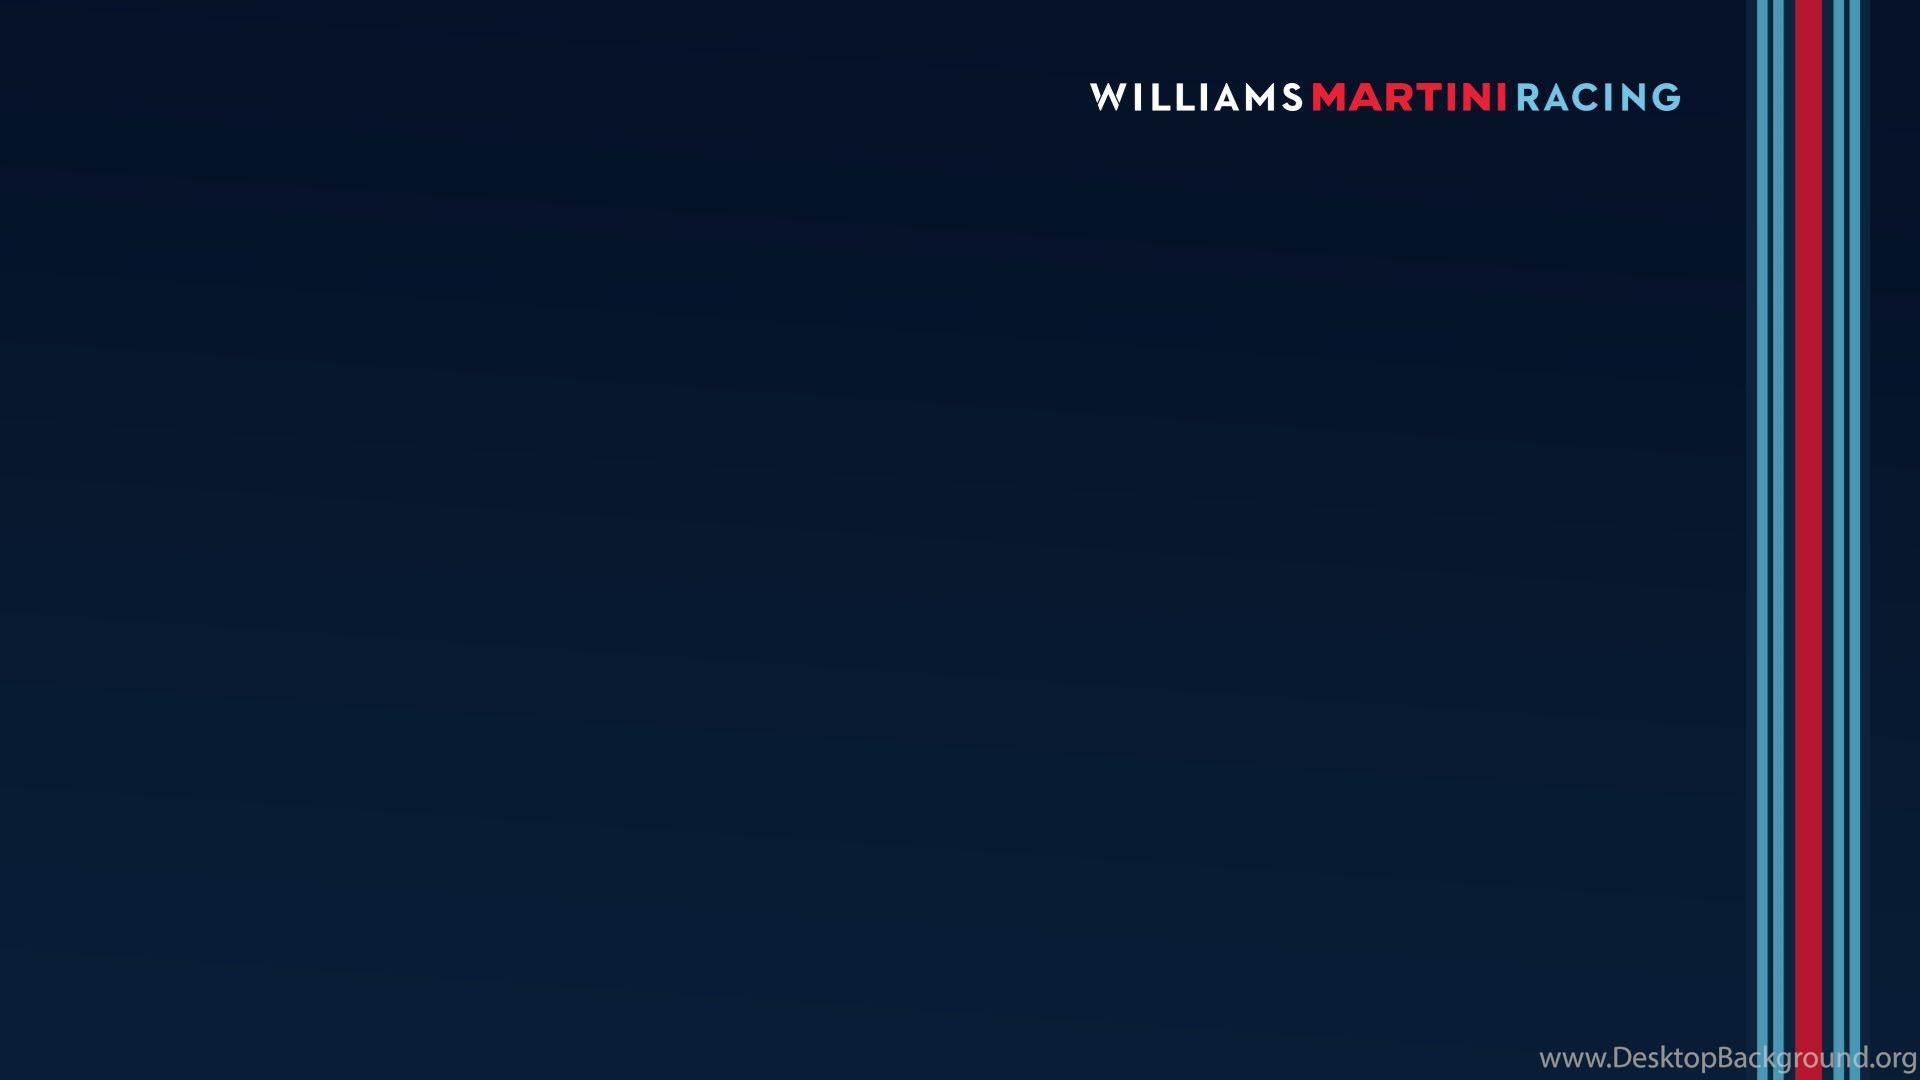 seeing as everyone is making williams martini racing